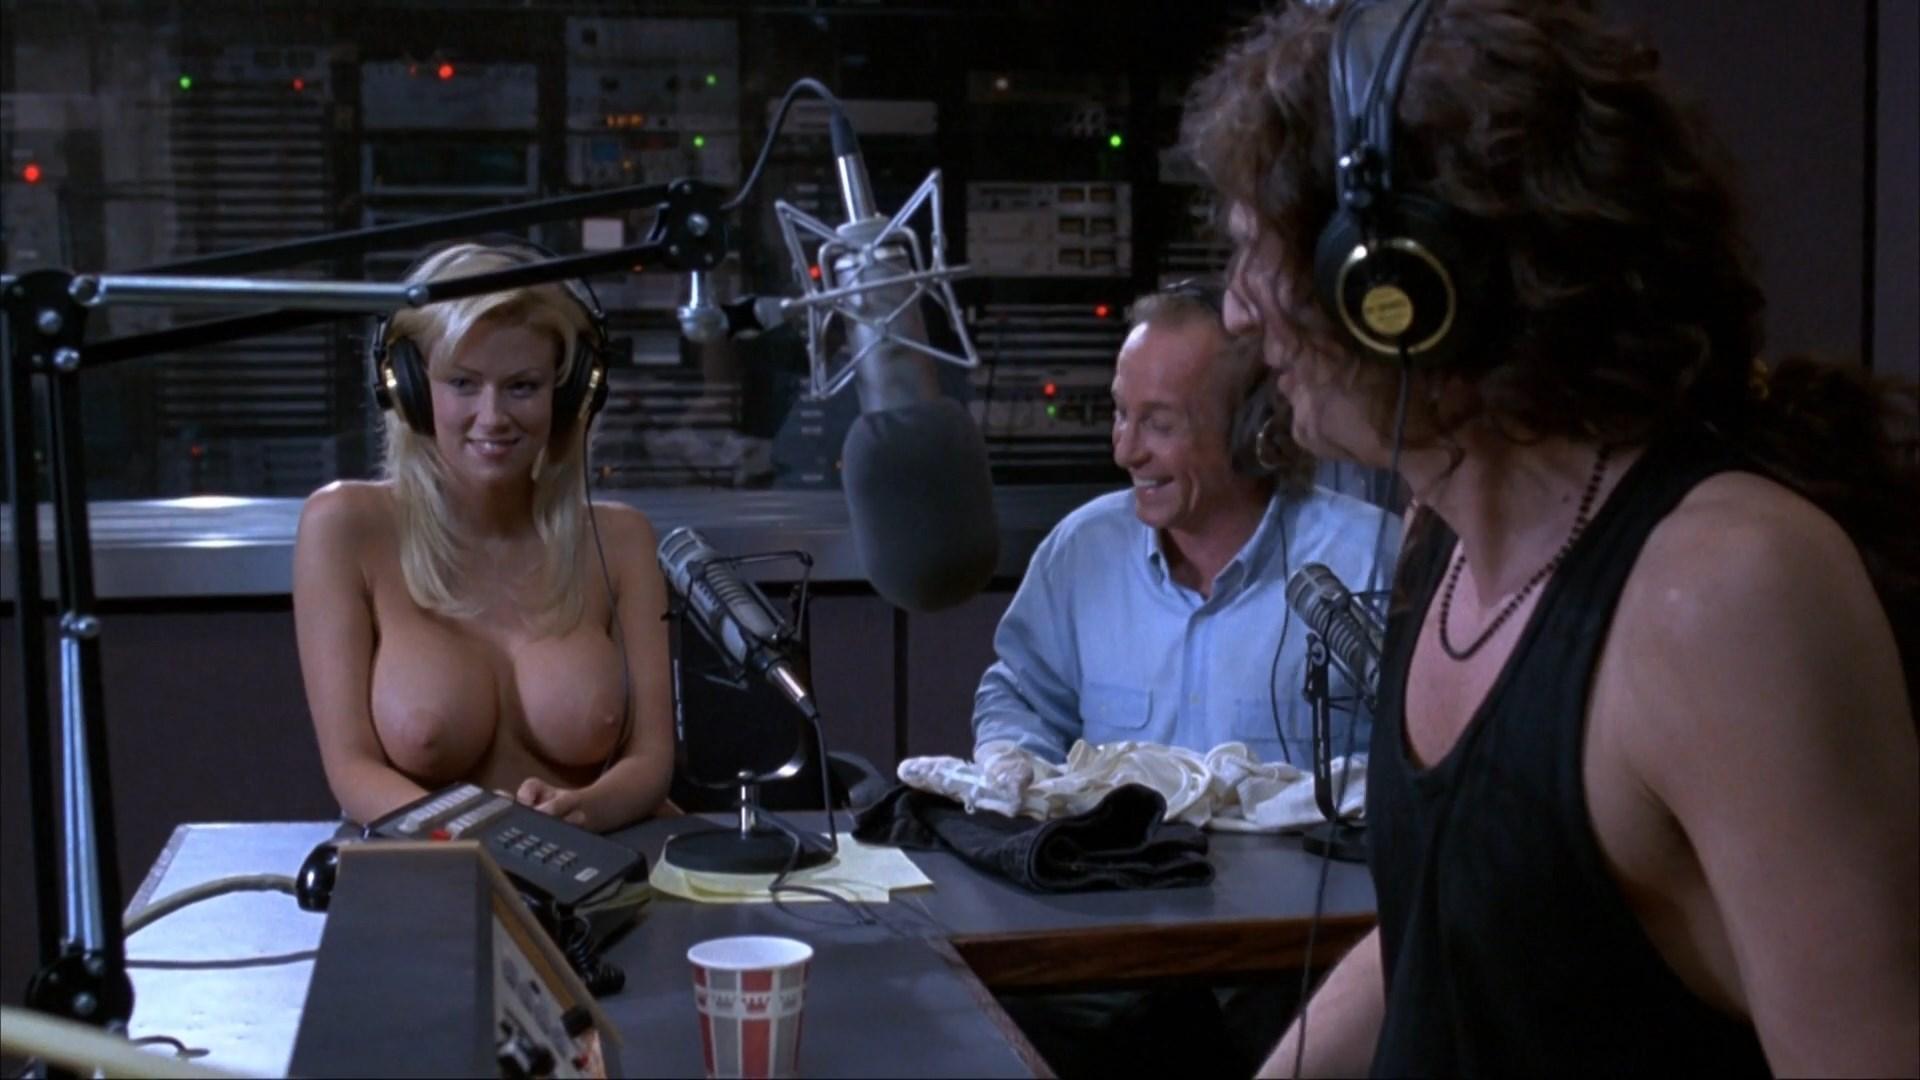 Howard Stern Naked Girls nude video celebs » jenna jameson nude - howard stern's